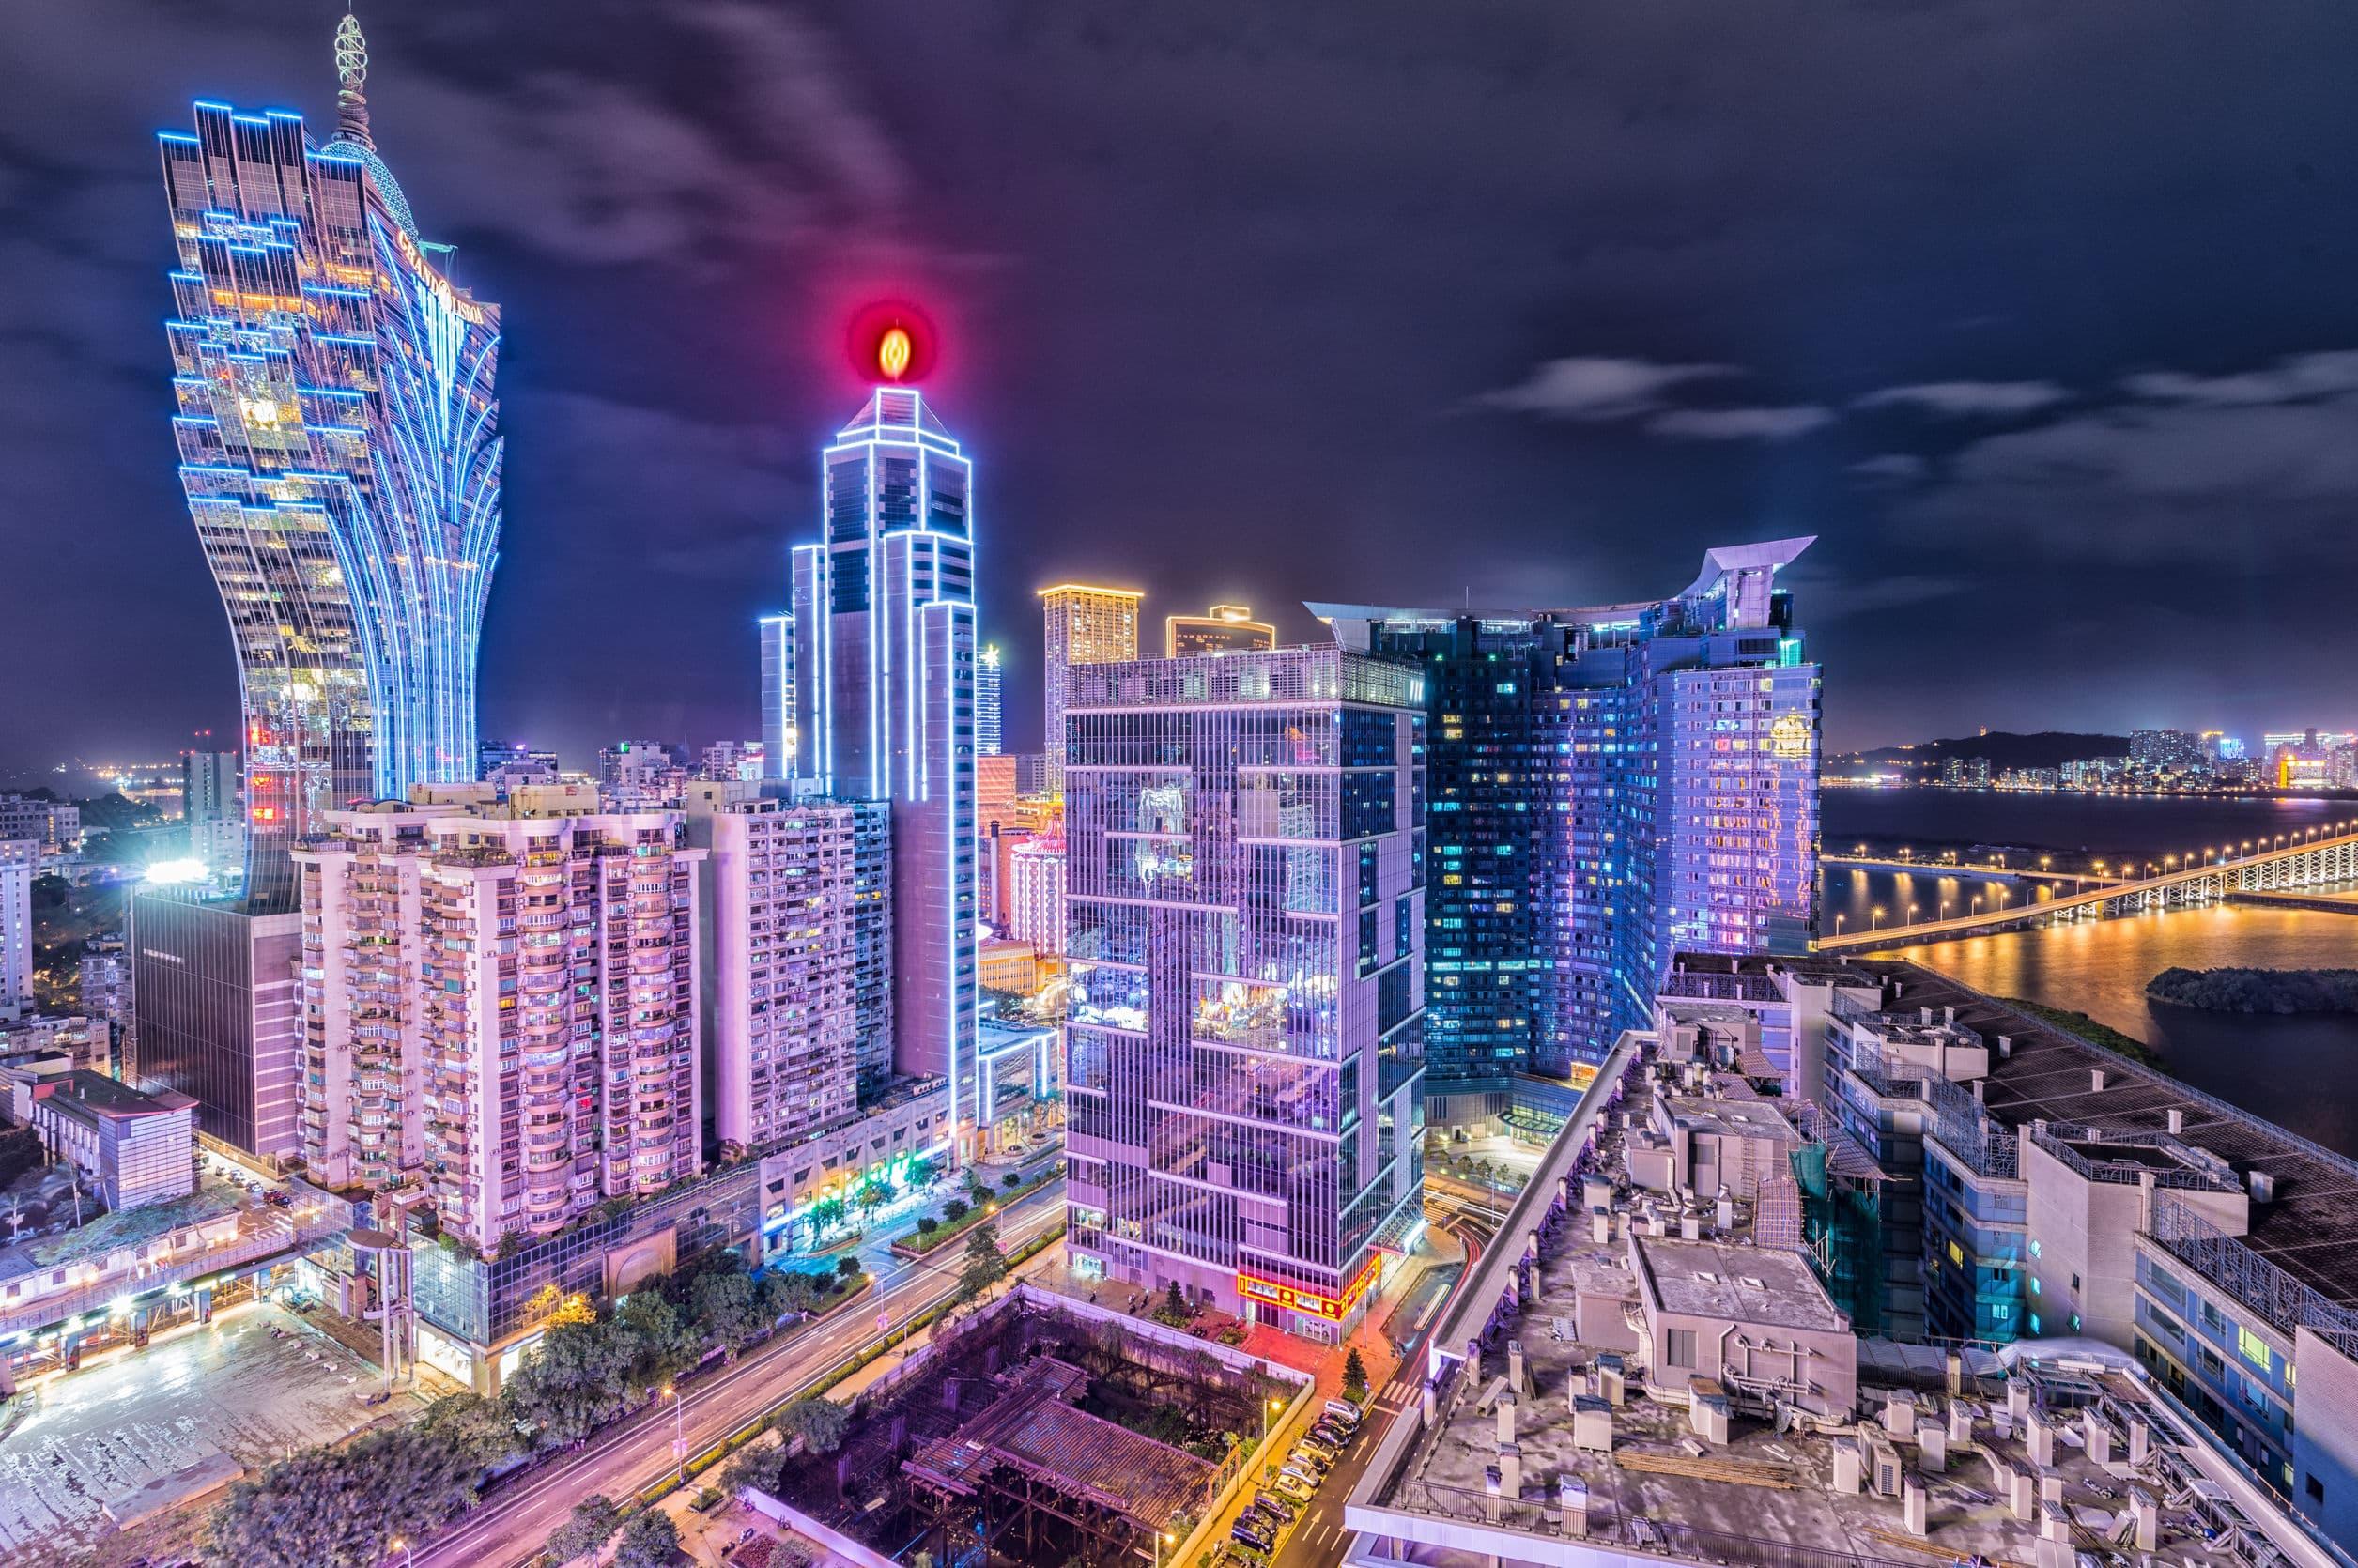 Macau night skyline